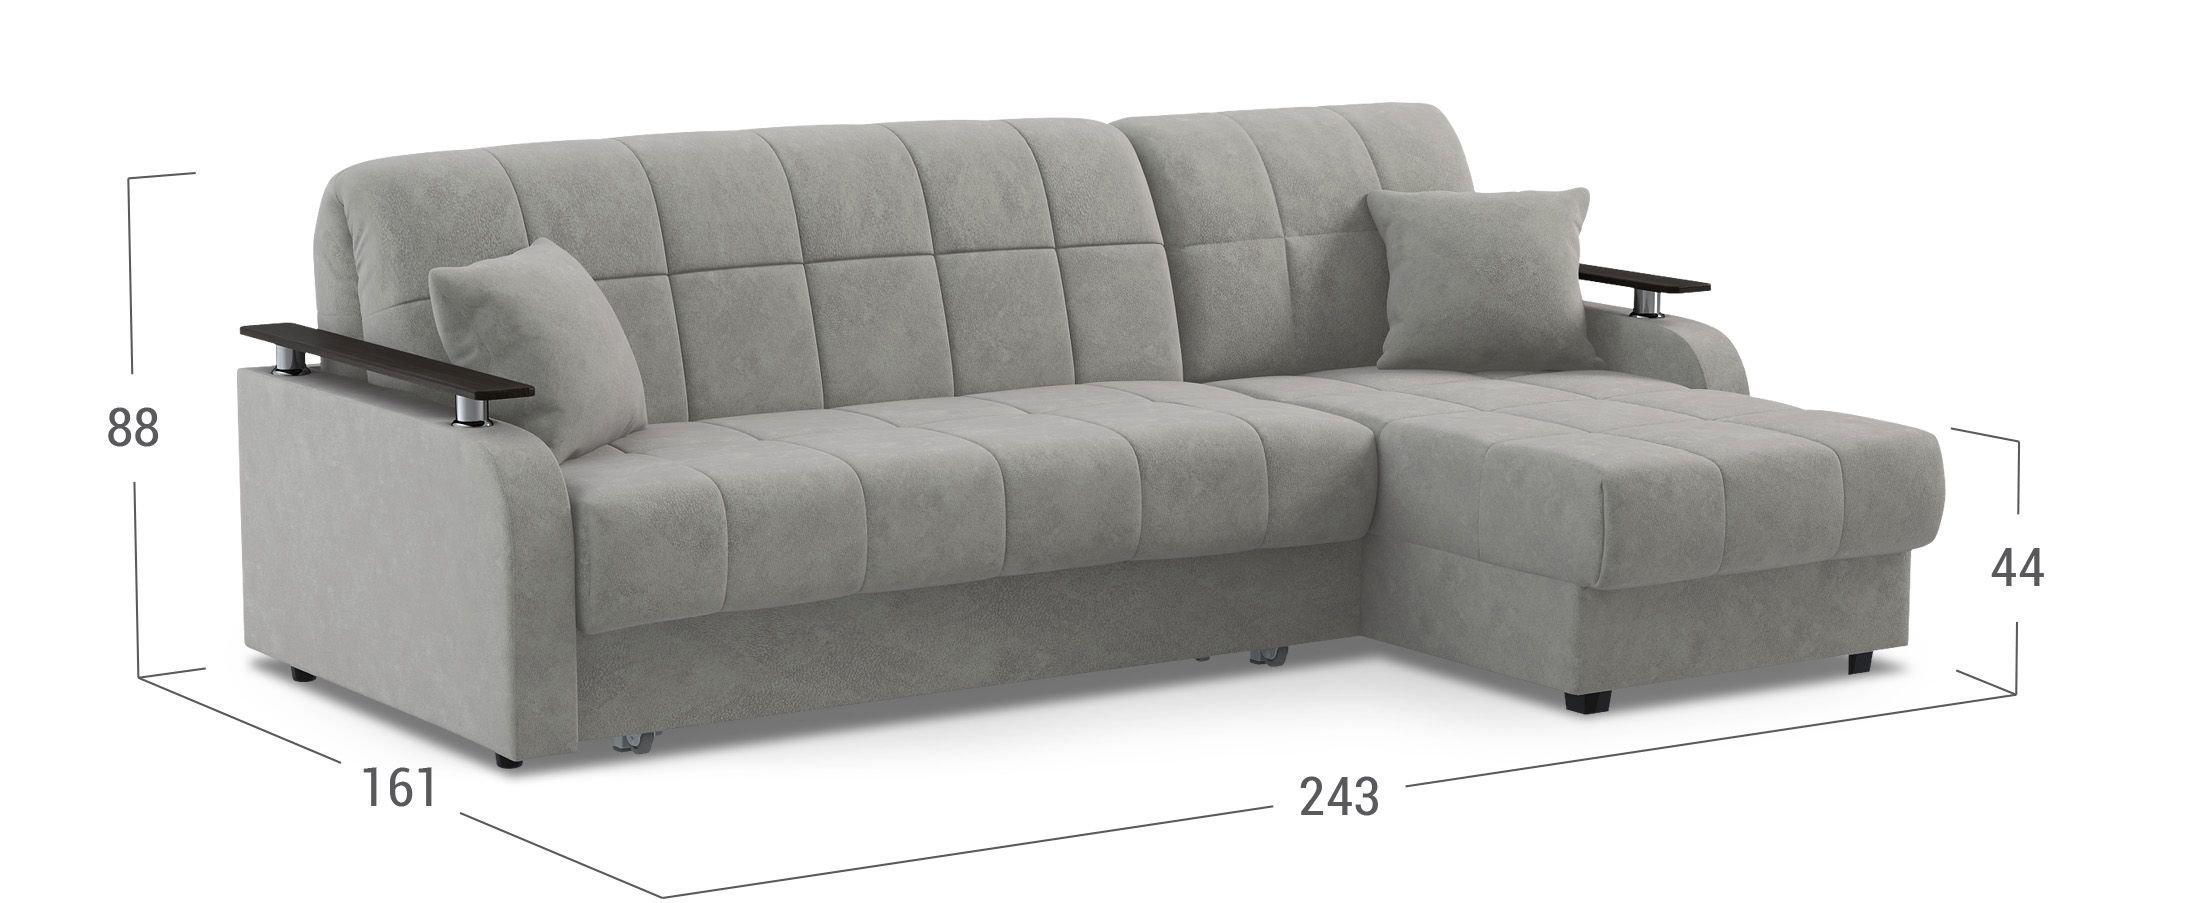 Преимущества диванов аккордеон - рекомендации MOON-TRADE.RU